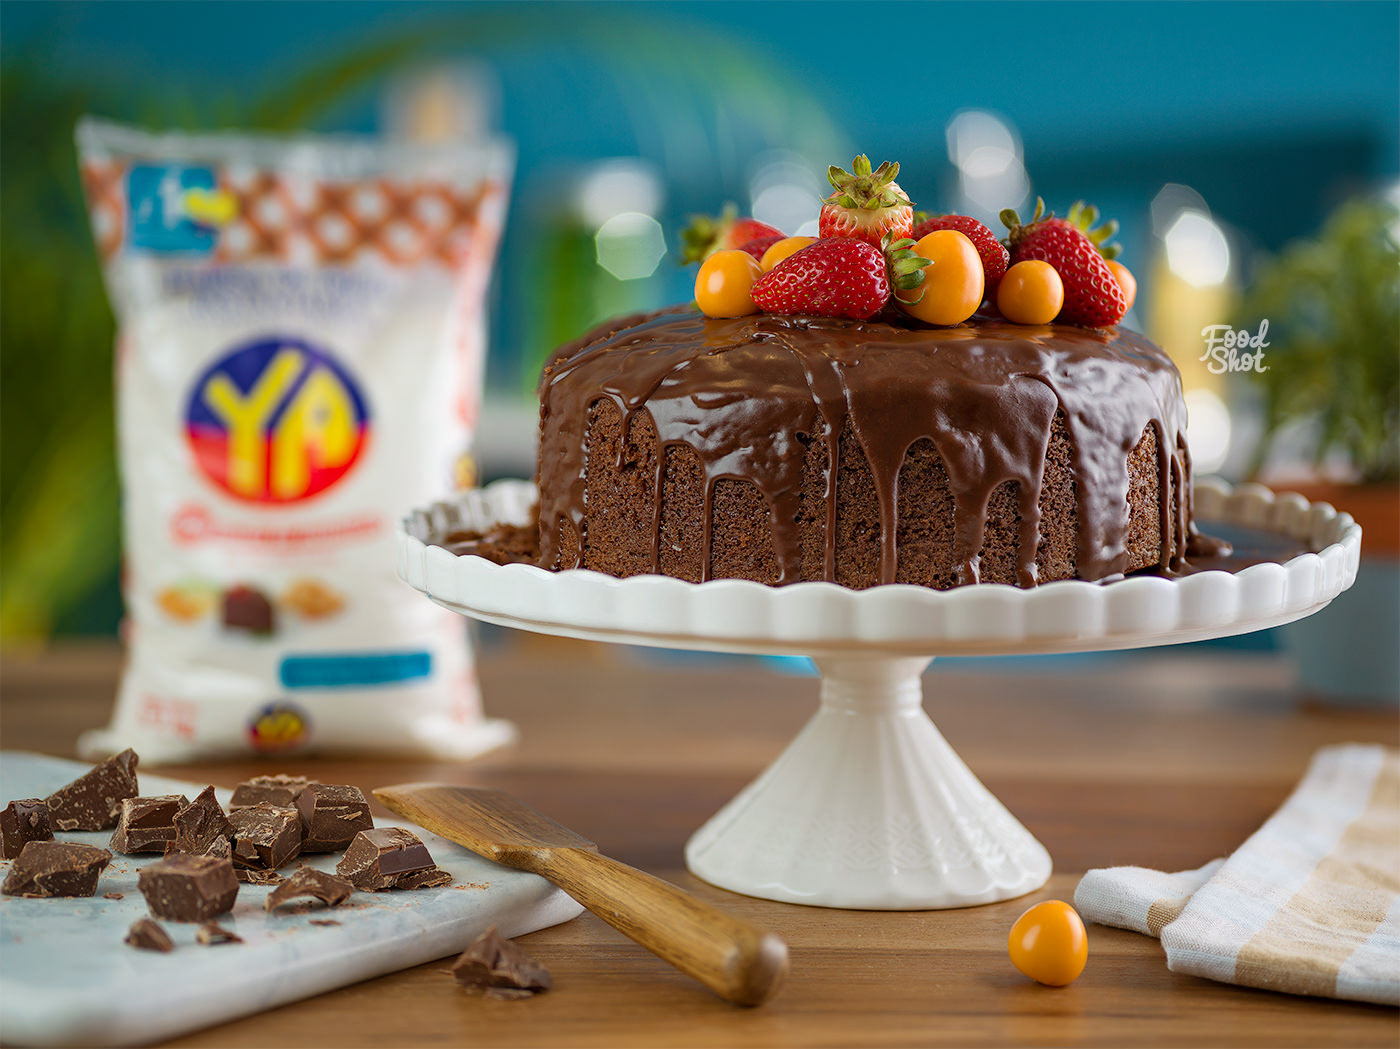 Image may contain: dessert, cake and birthday cake